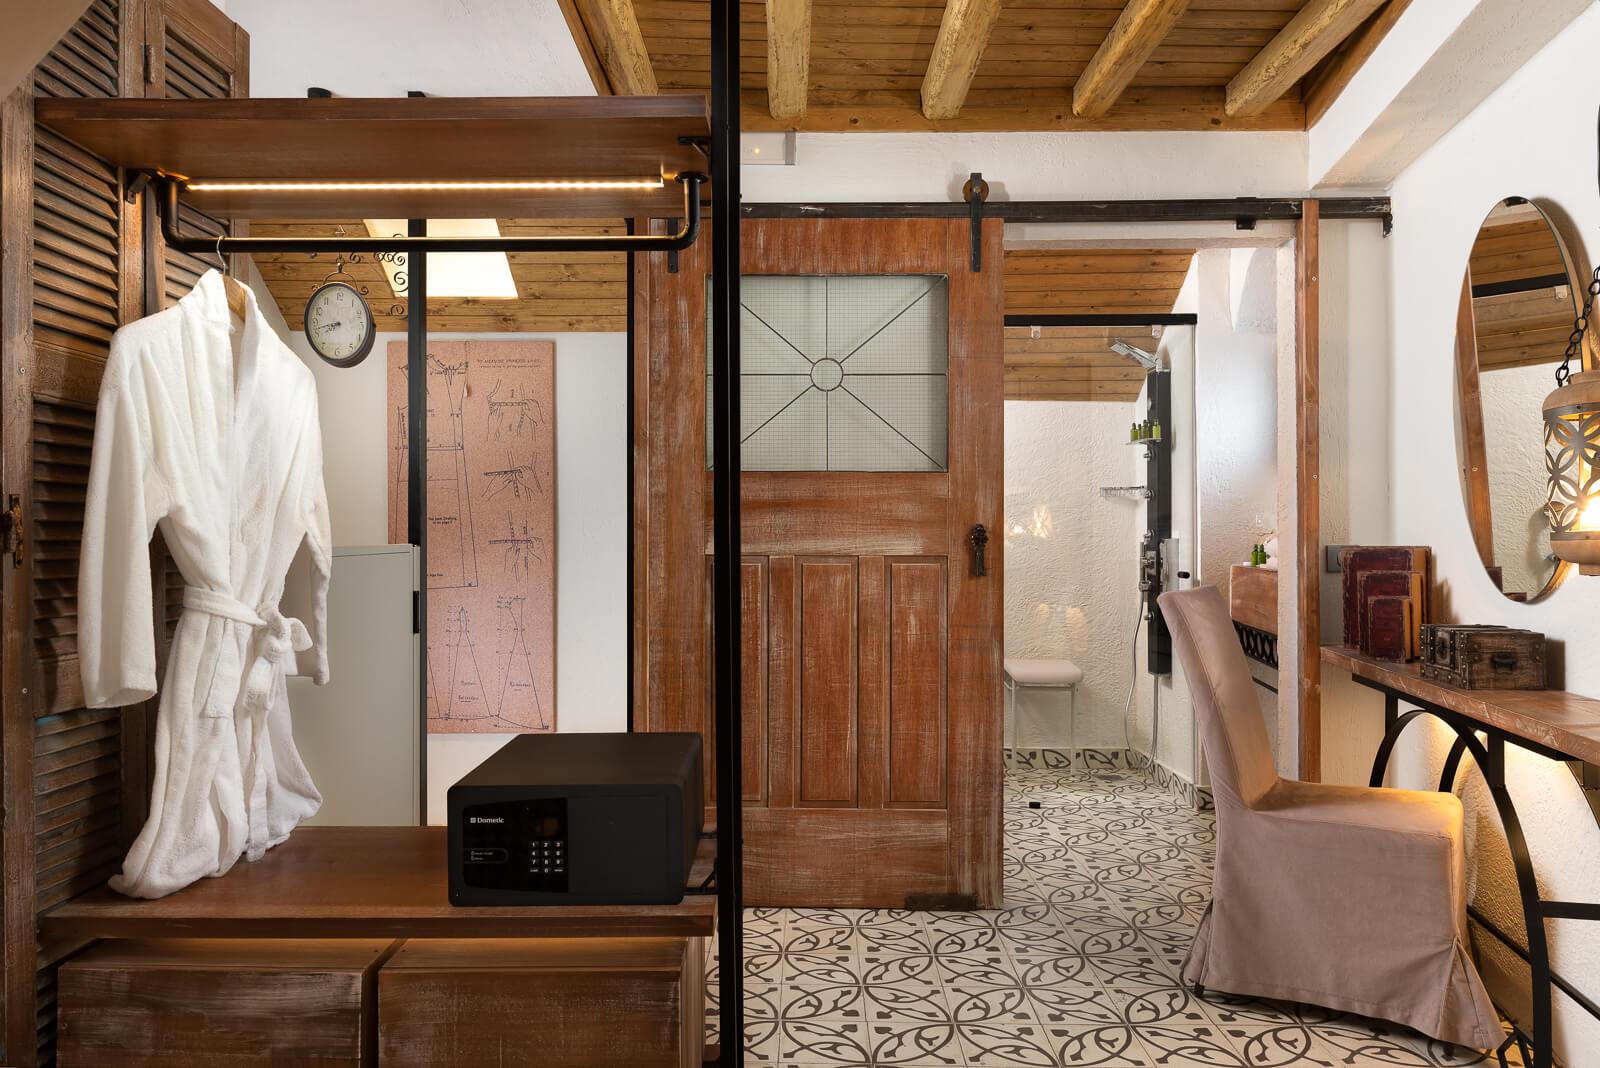 Elafos Hotel Room - Elakati Hotel in Rhodes